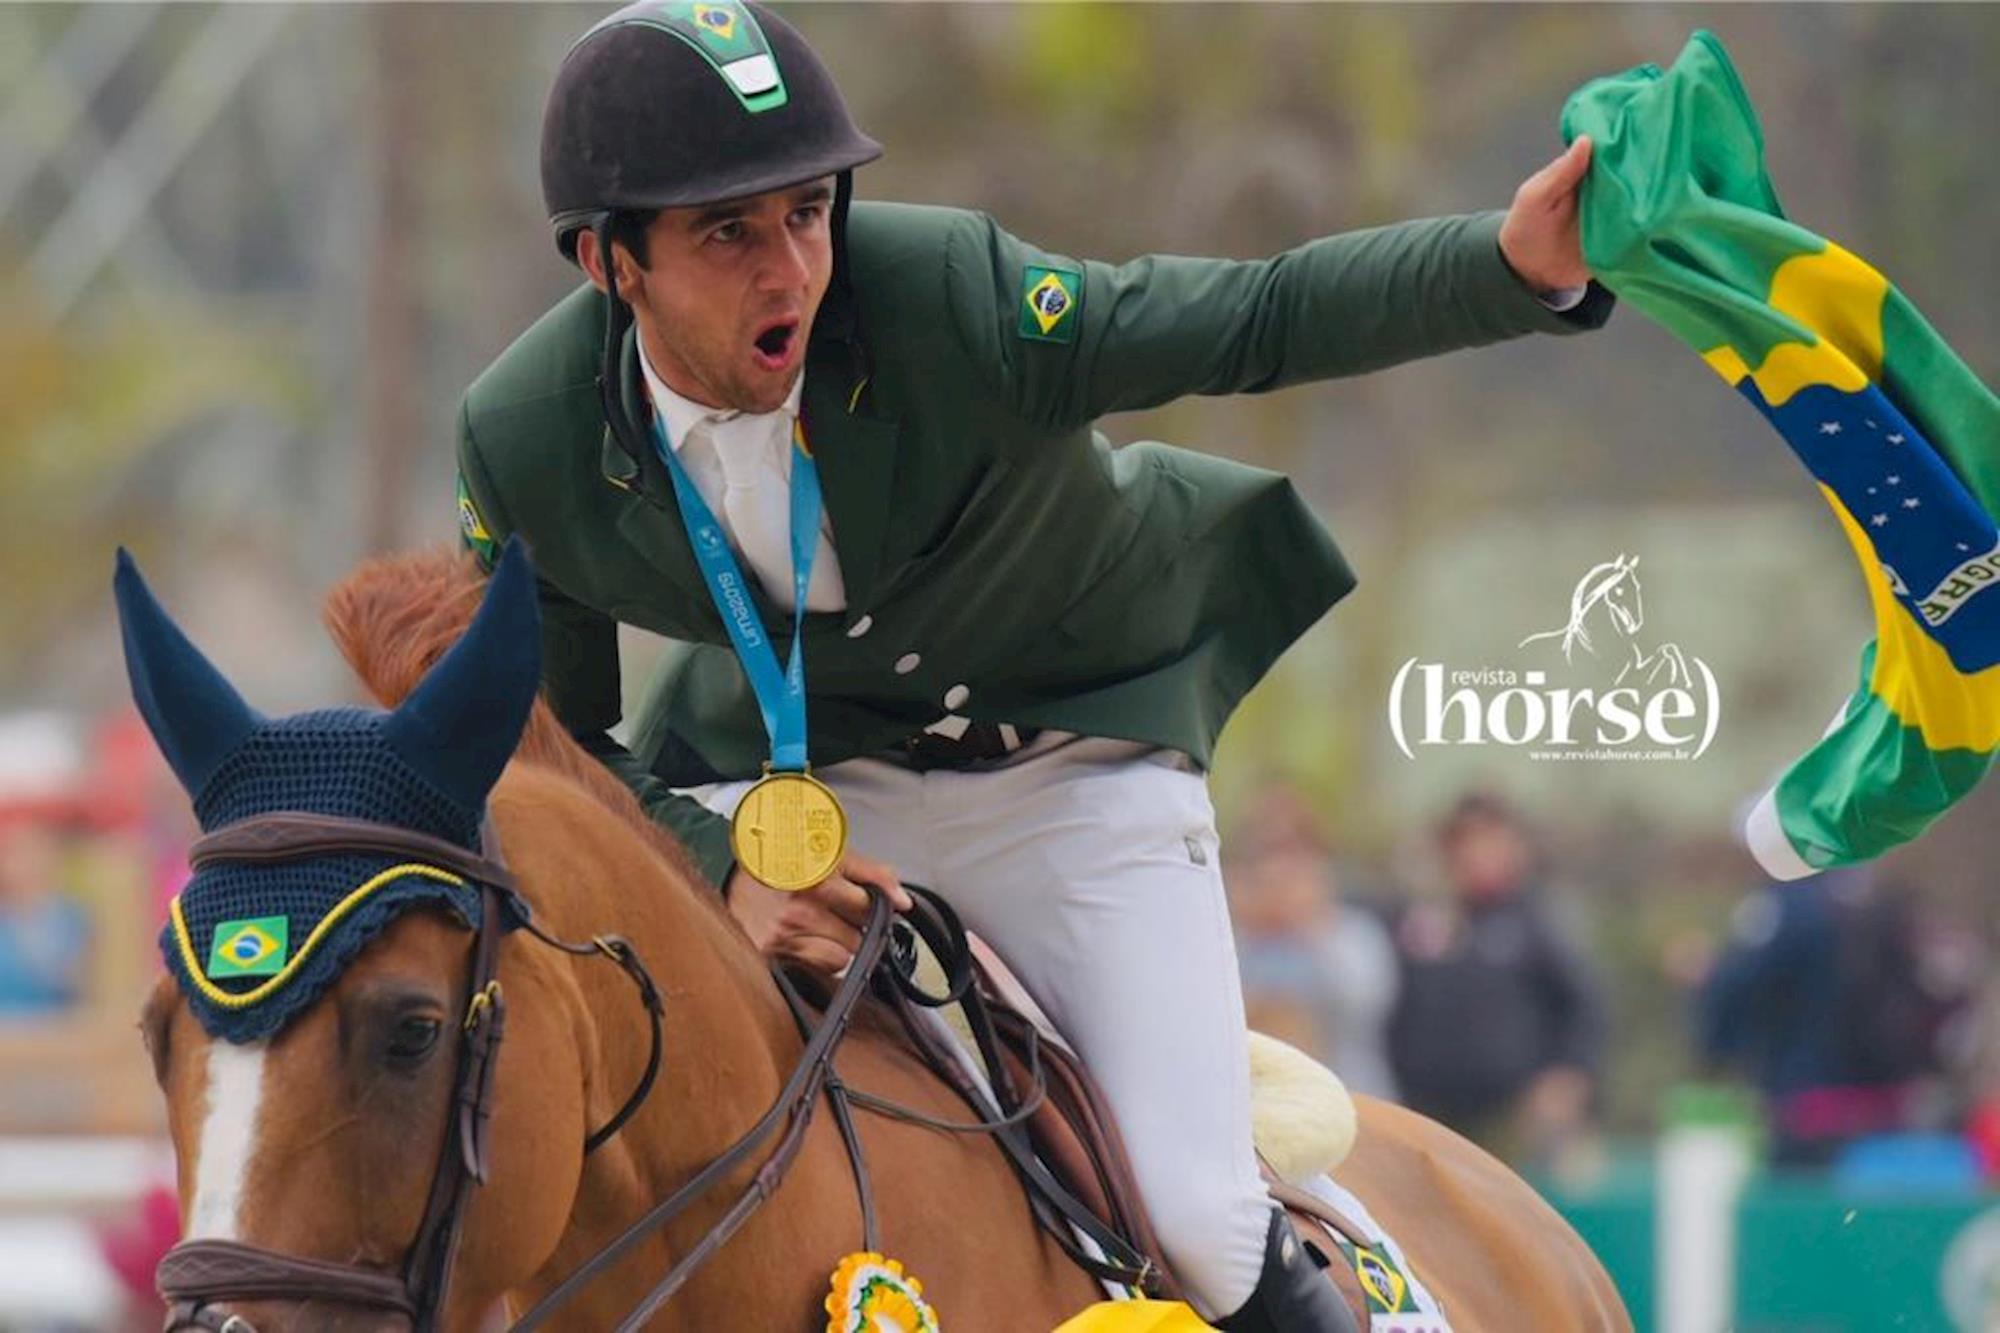 final, salto, pan de lima 2019, Marlon Zanotelli, Sirene de La Motte:, Fagner Almeida/Revista Horse